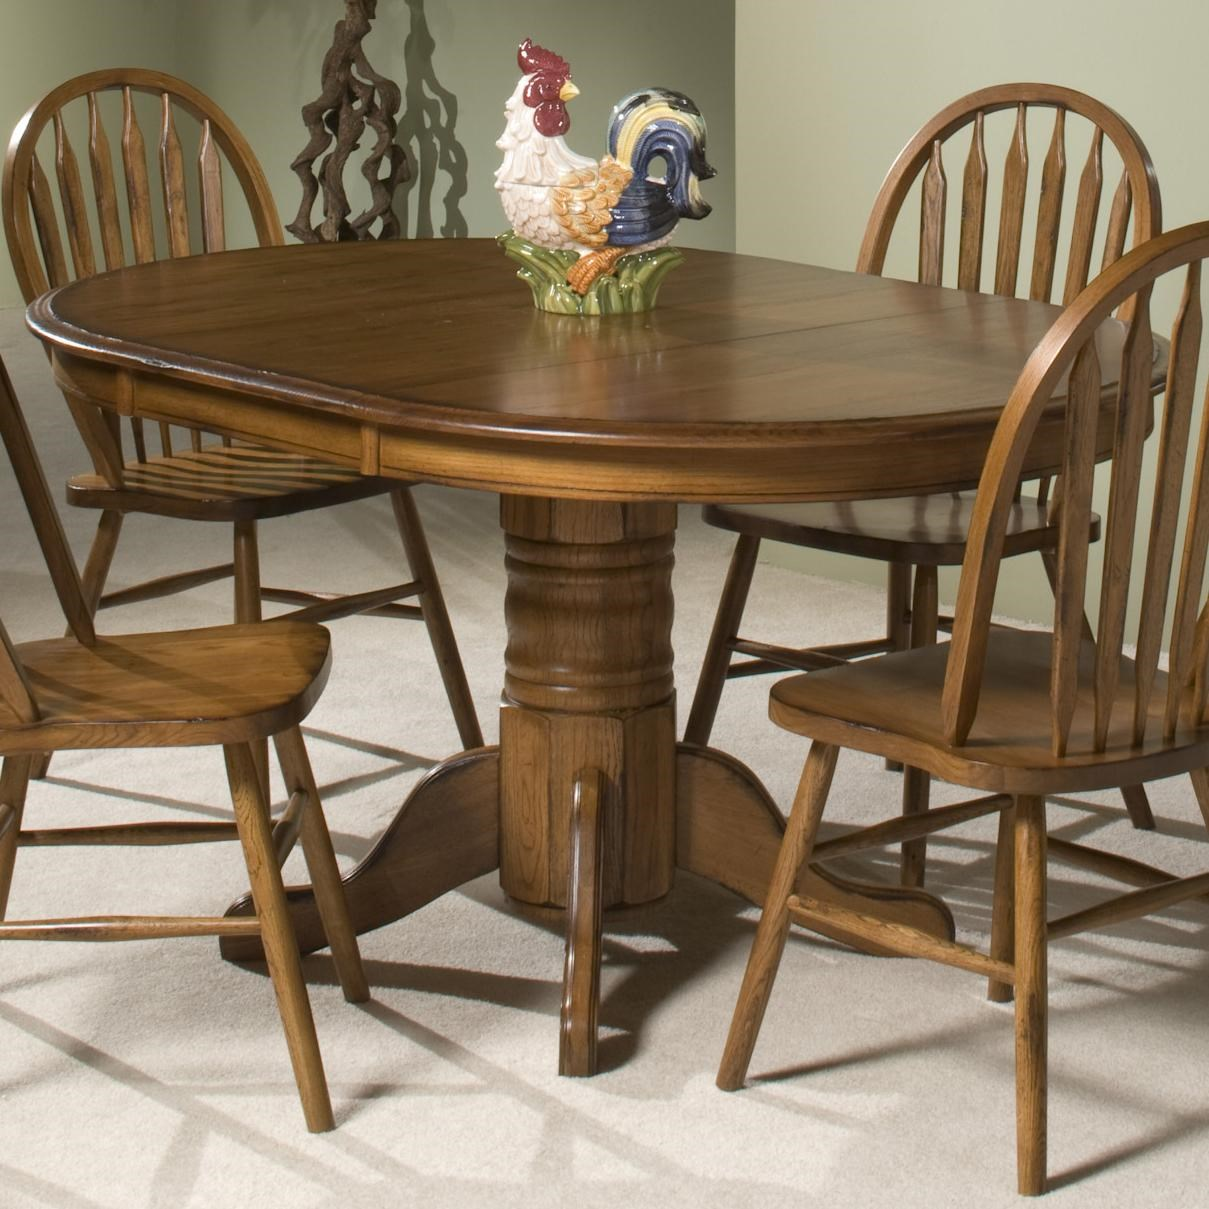 Intercon Classic Oak Single Pedestal Round Dining Table  : classic20oak20coco ta i4260 bru bsetop bjpgscalebothampwidth500ampheight500ampfsharpen25ampdown from www.storyandlee.com size 500 x 500 jpeg 64kB